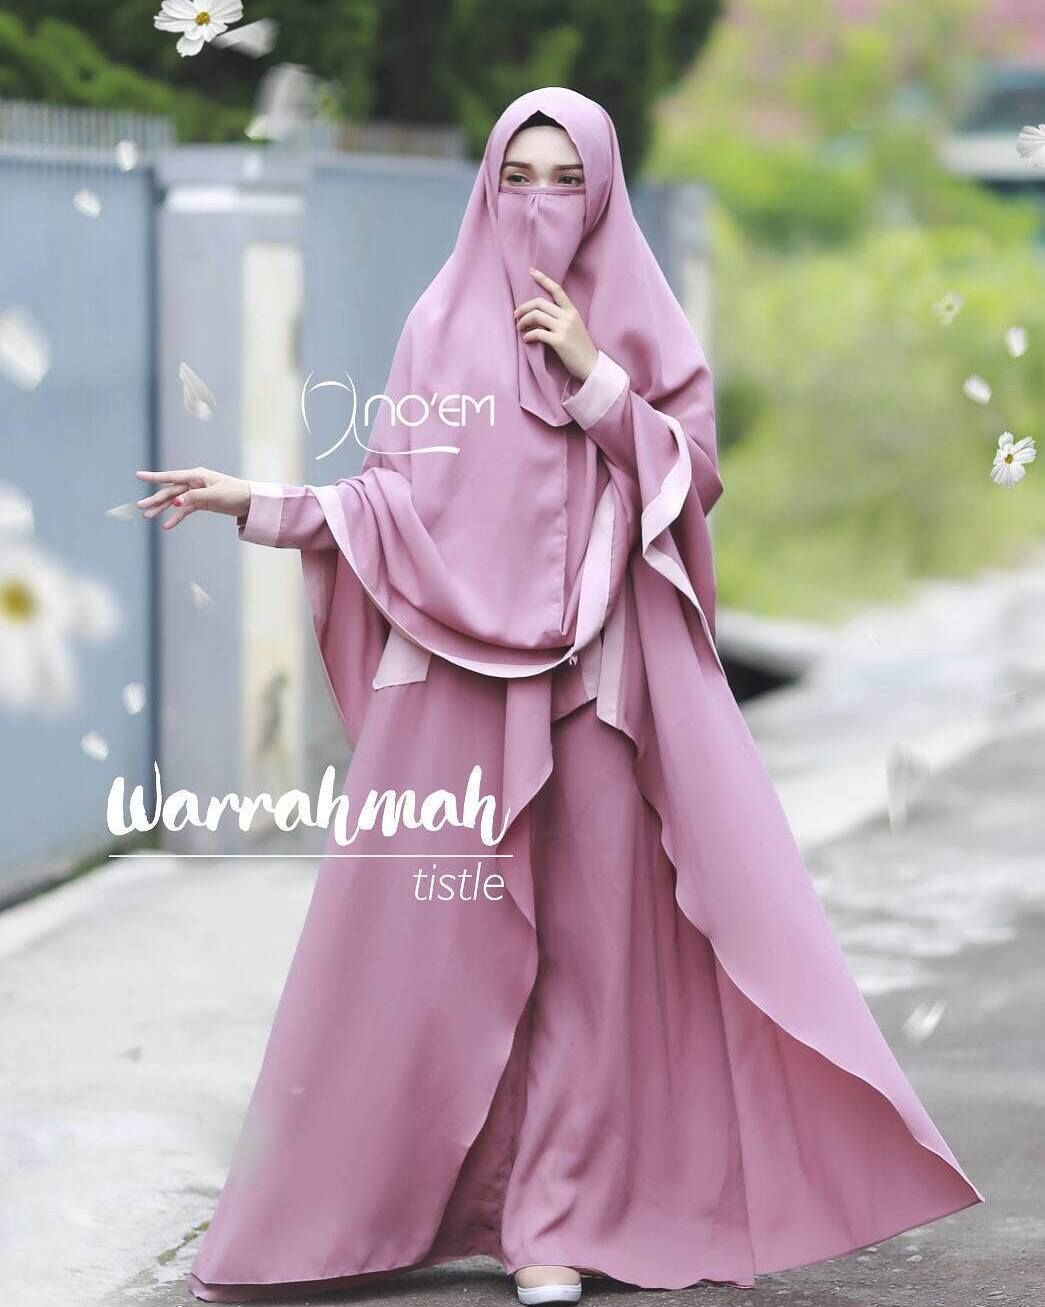 Pin By Tausiyah Cinta On Tausiyahcinta In 2018 Pinterest Niqab Lakesha Tunik Dusty Dressed To Excite